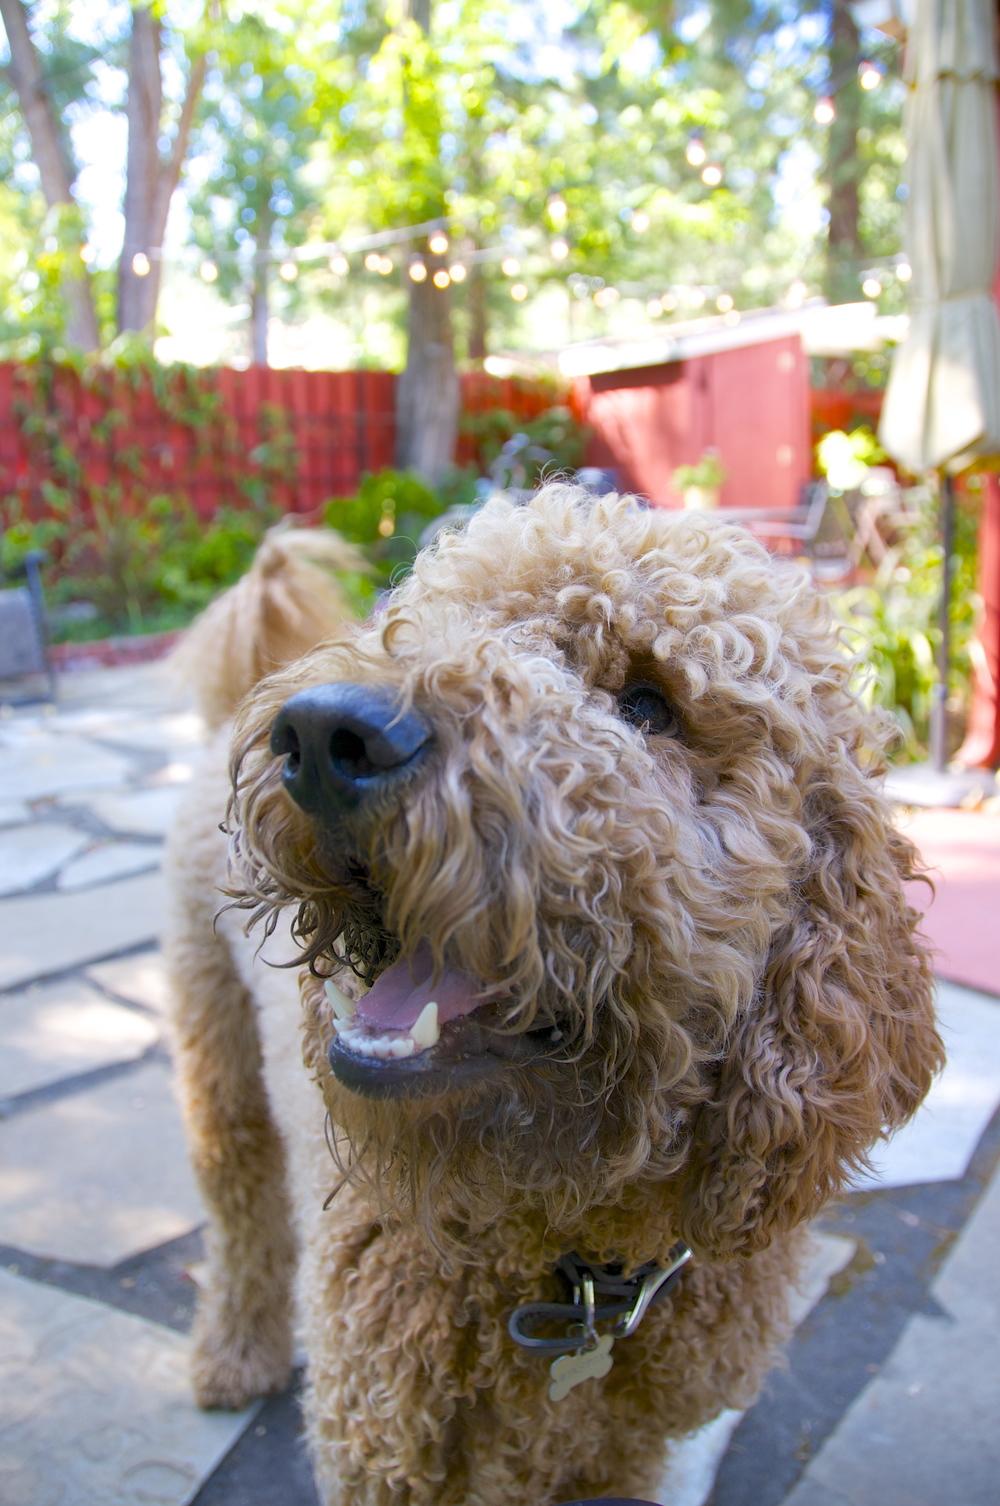 Winnie my grandog has focus!